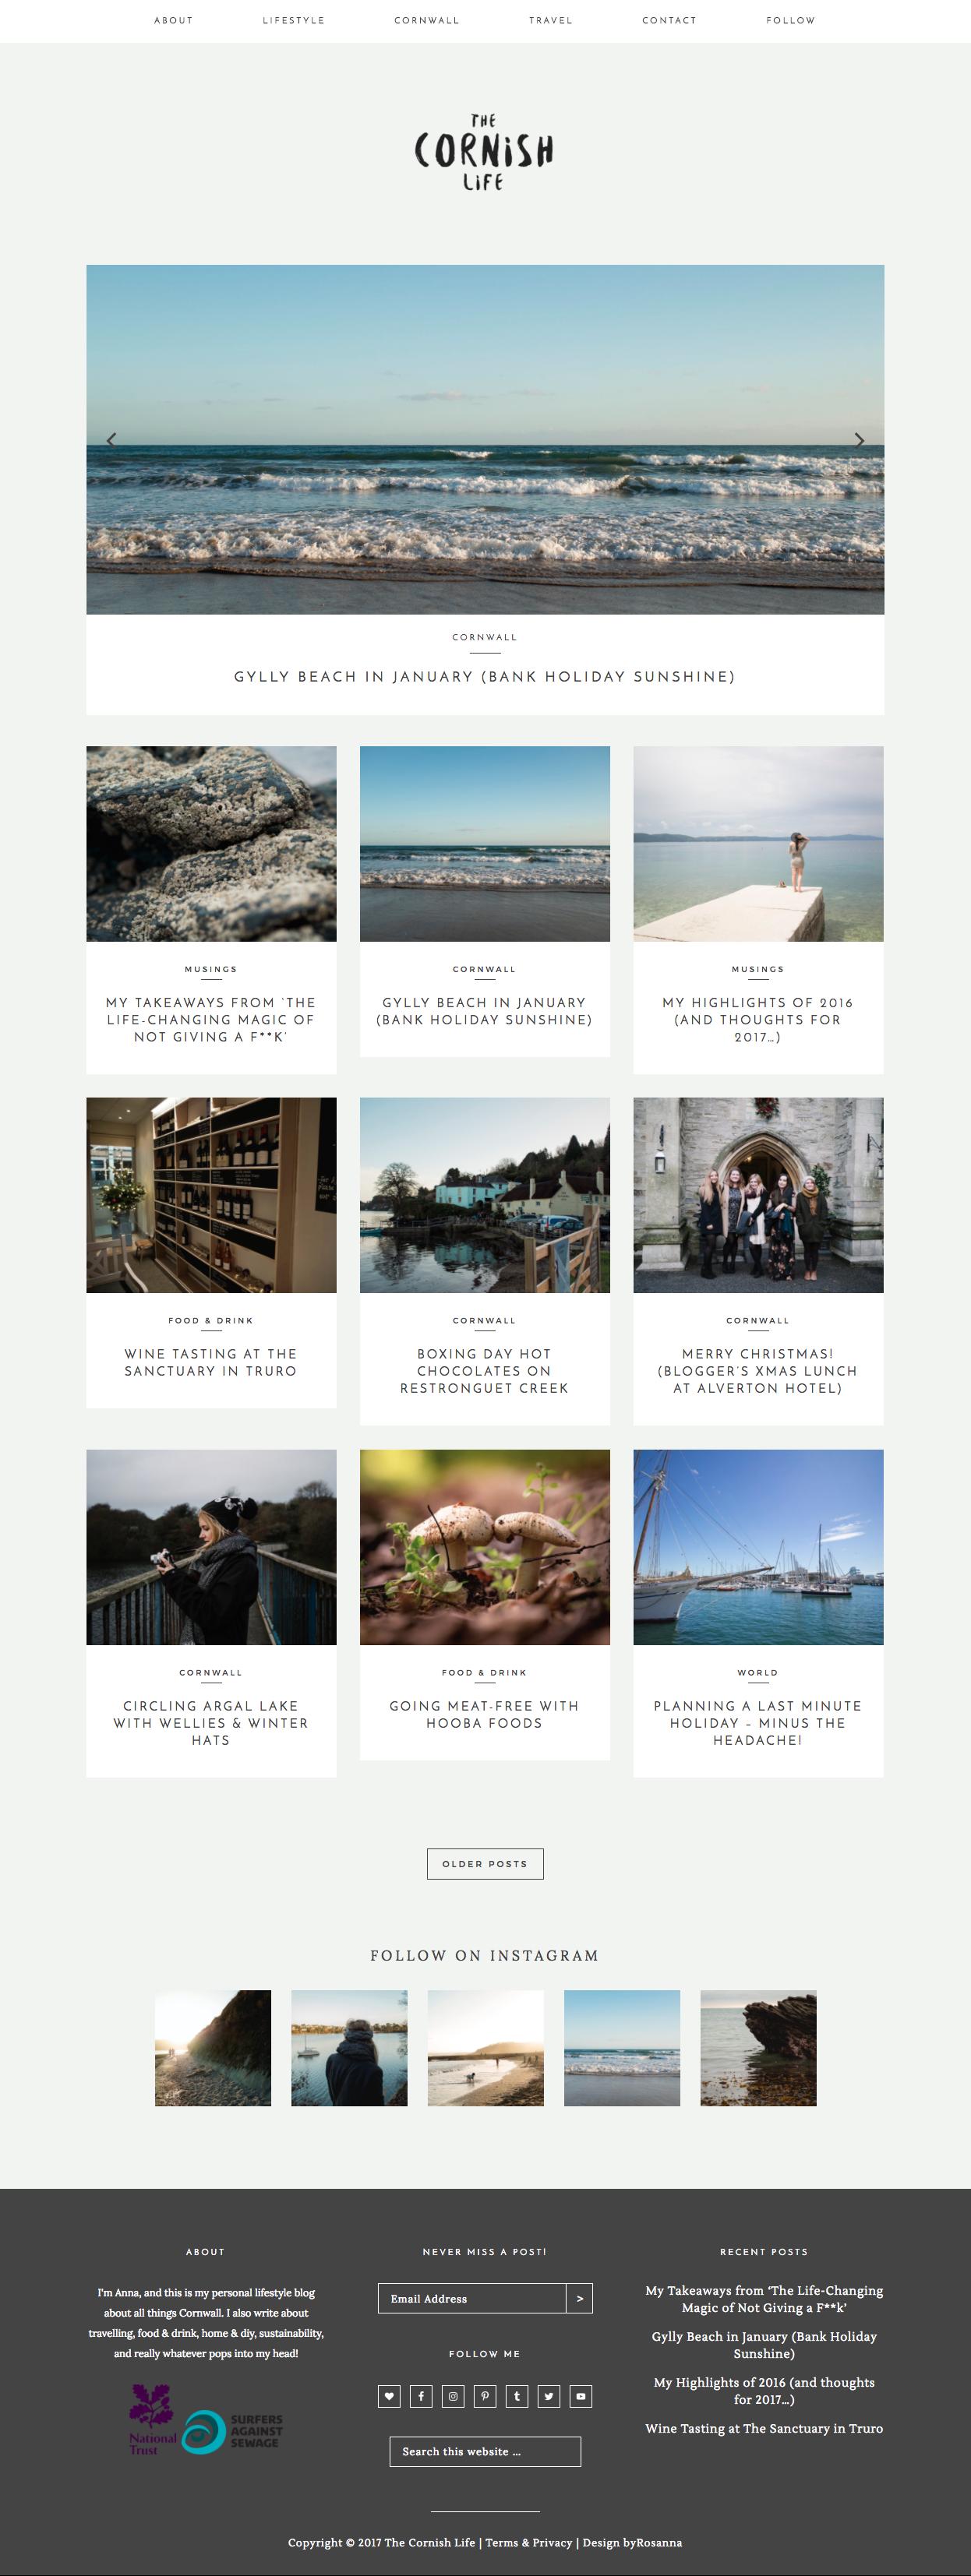 The Cornish Life website | byRosanna